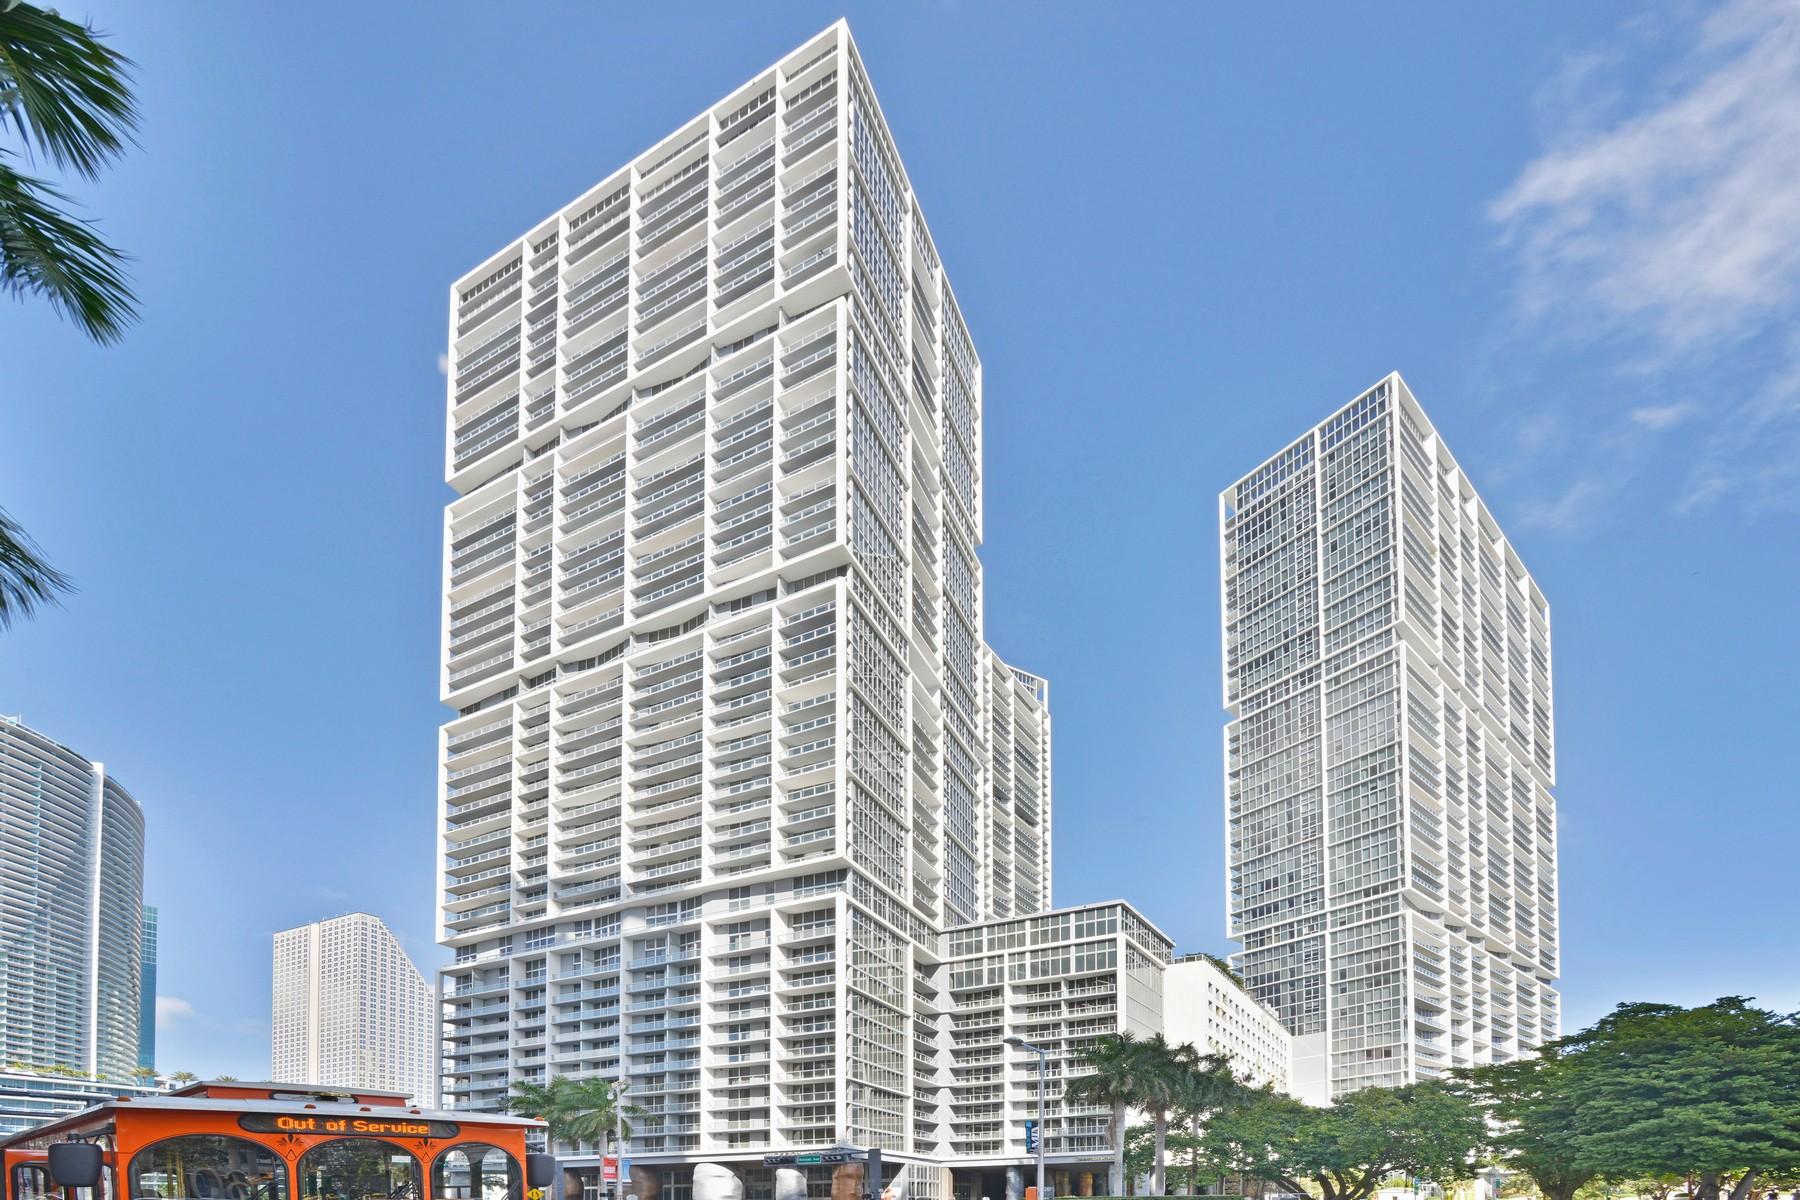 Condominium for Sale at 465 Brickell Ave #1703 465 Brickell Ave, #1703 Miami, Florida 33131 United States